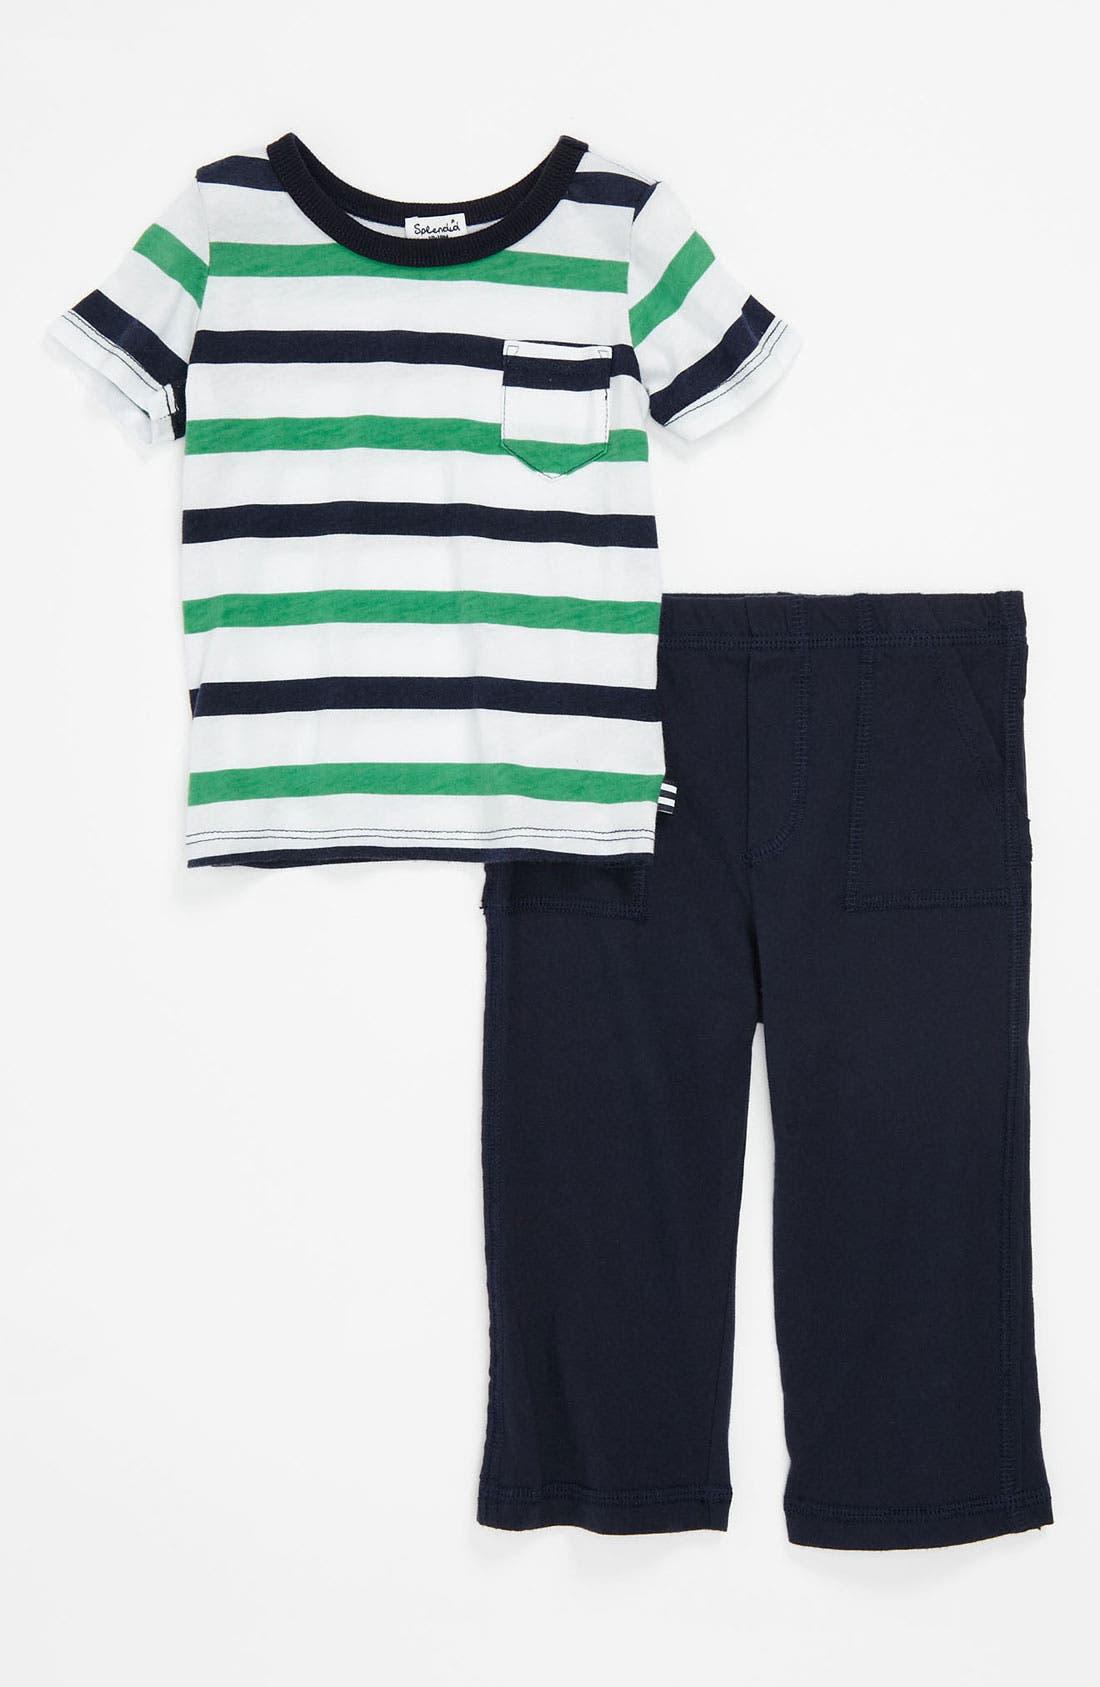 Main Image - Splendid Shirt & Pants (Infant)